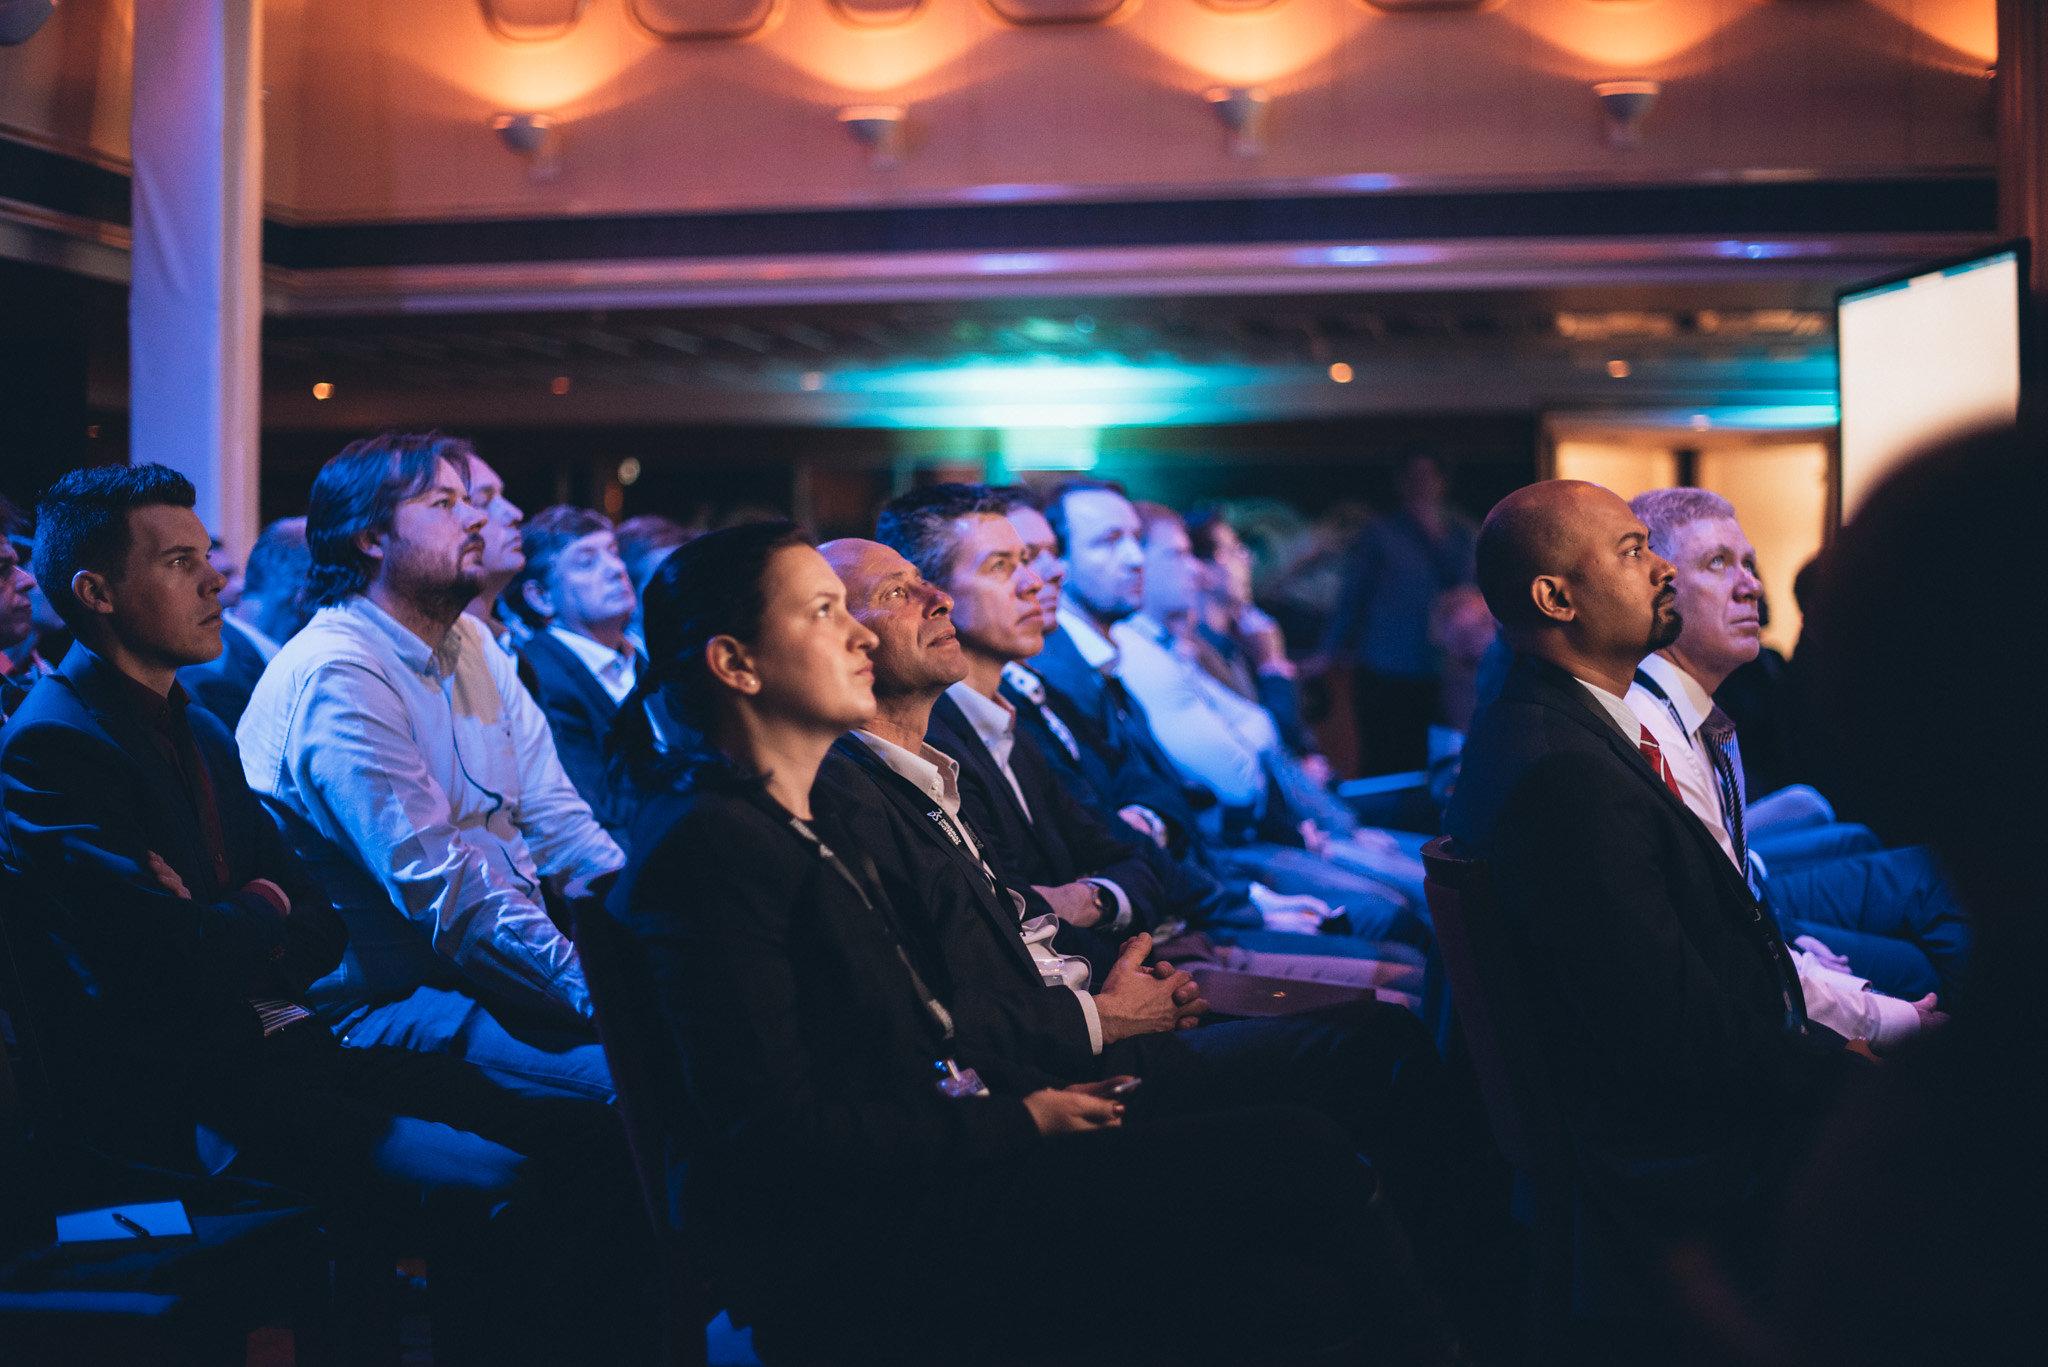 3DX_forum_event_highlights_rotterdam_presentations-26.jpg